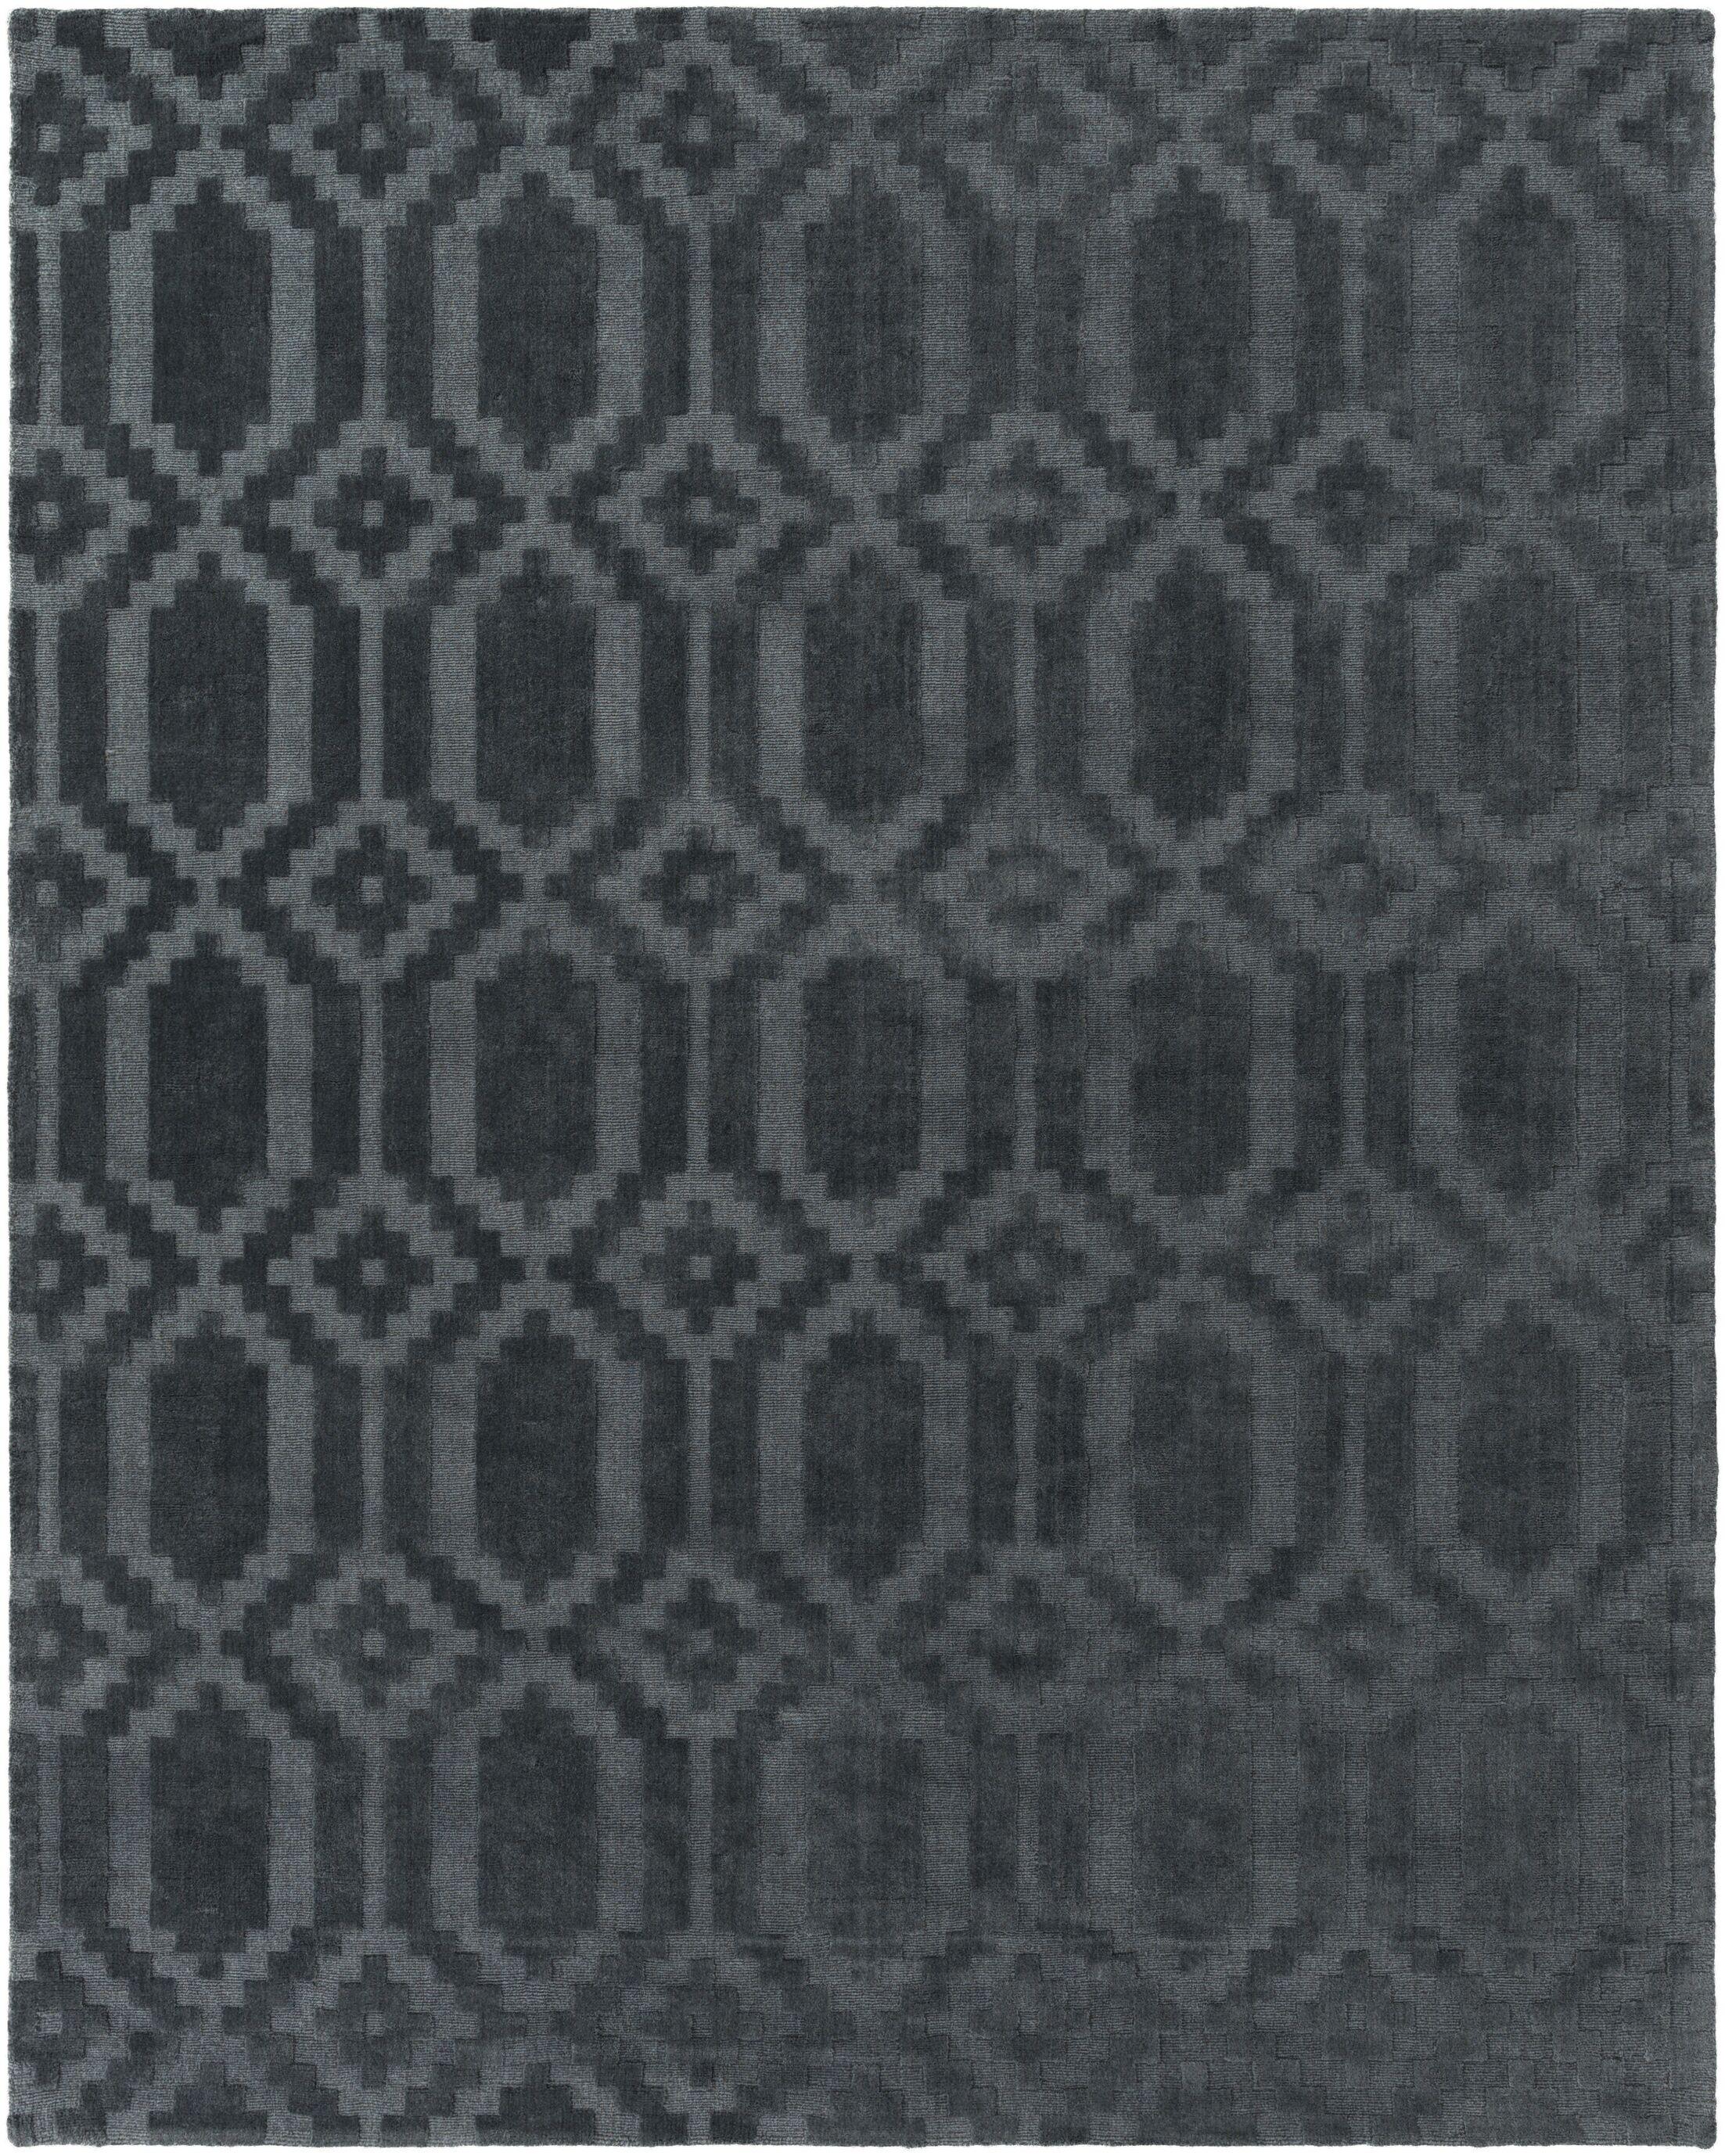 Brack Hand-Loomed Denim Area Rug Rug Size: Rectangle 6' x 9'